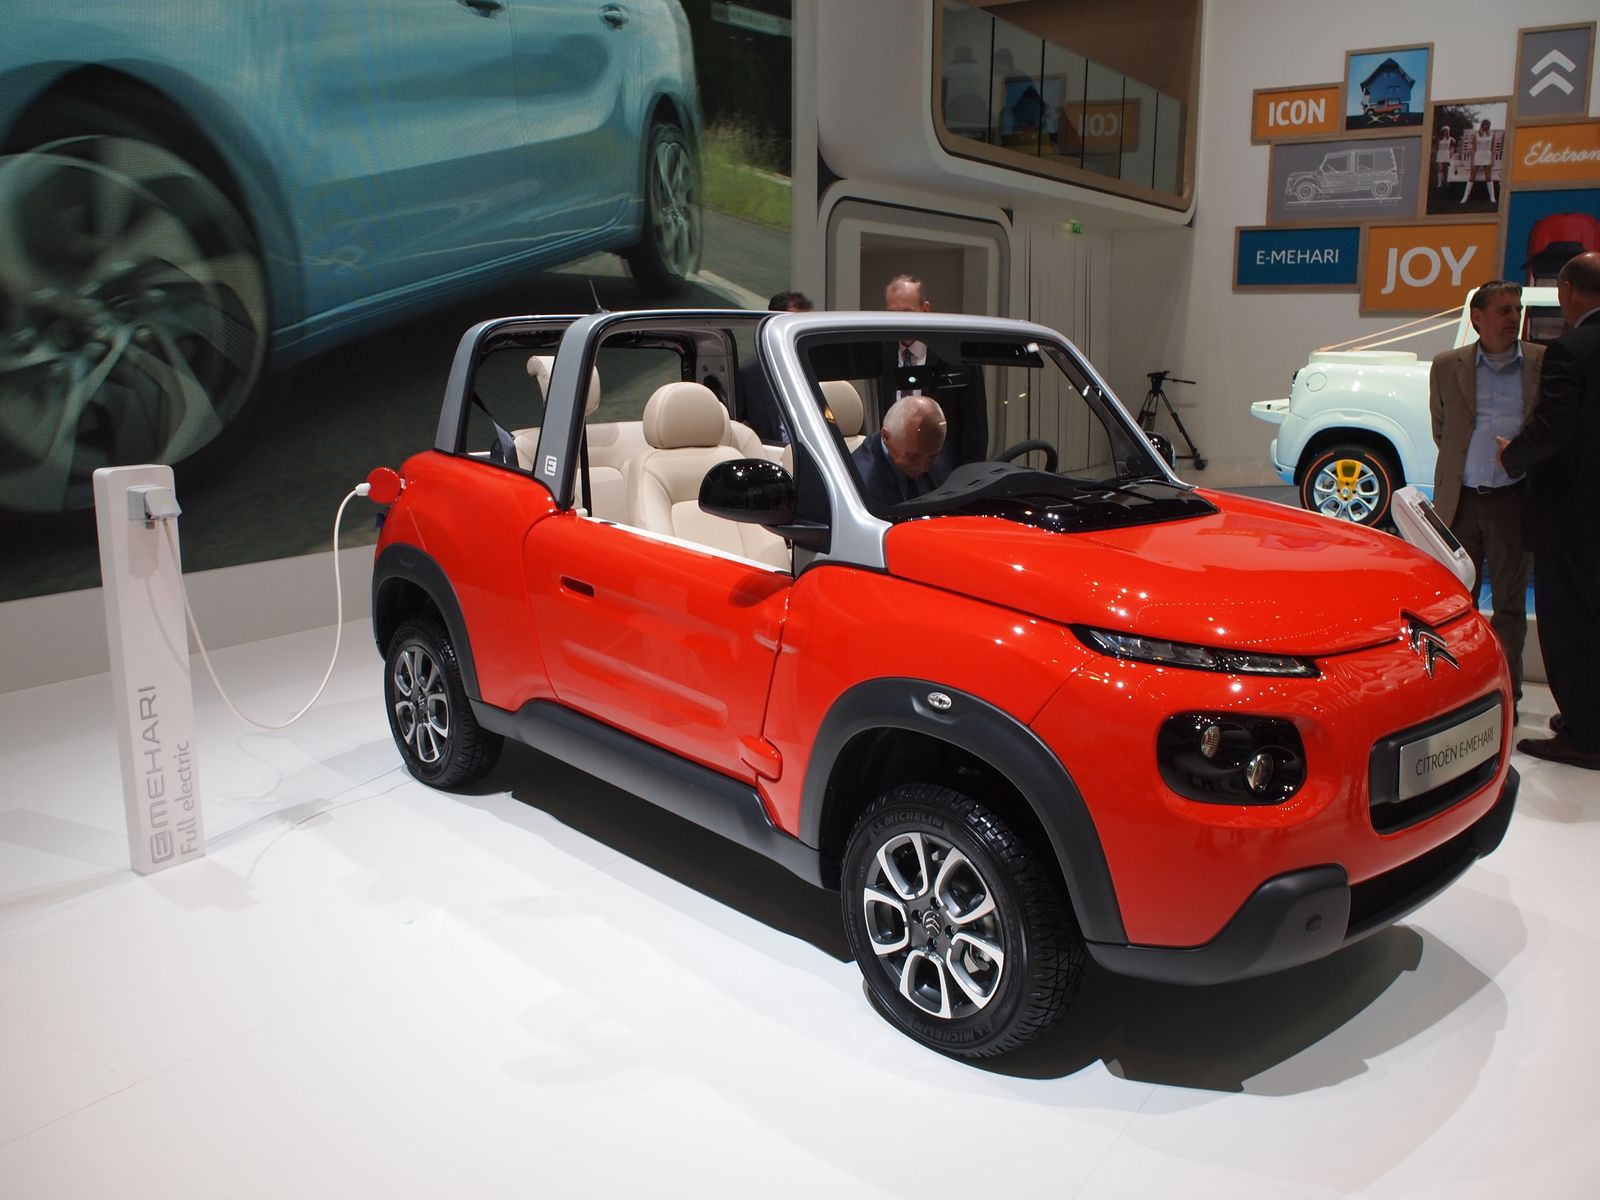 EINMALIGE VERWENDUNG Genf 2016 / Elektroautos / Citroen E-Mehari